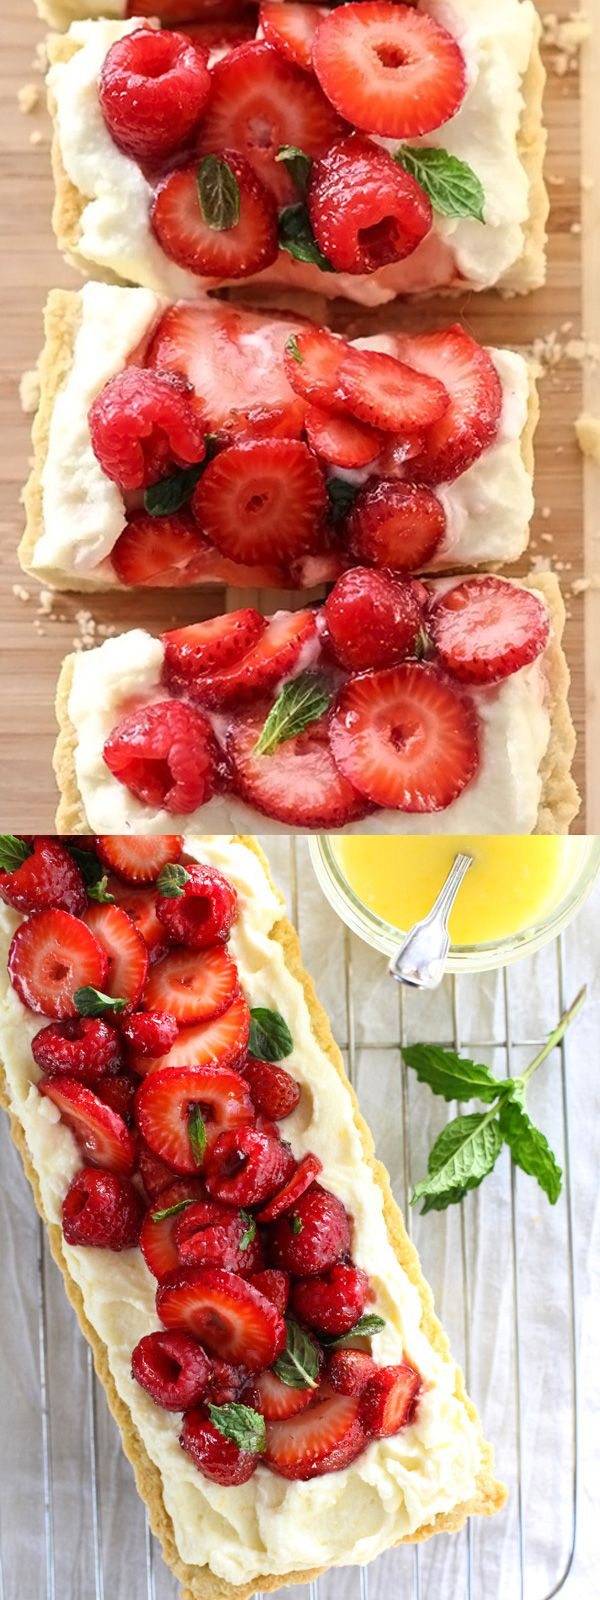 Berry Tart with Lemon Curd Mascarpone